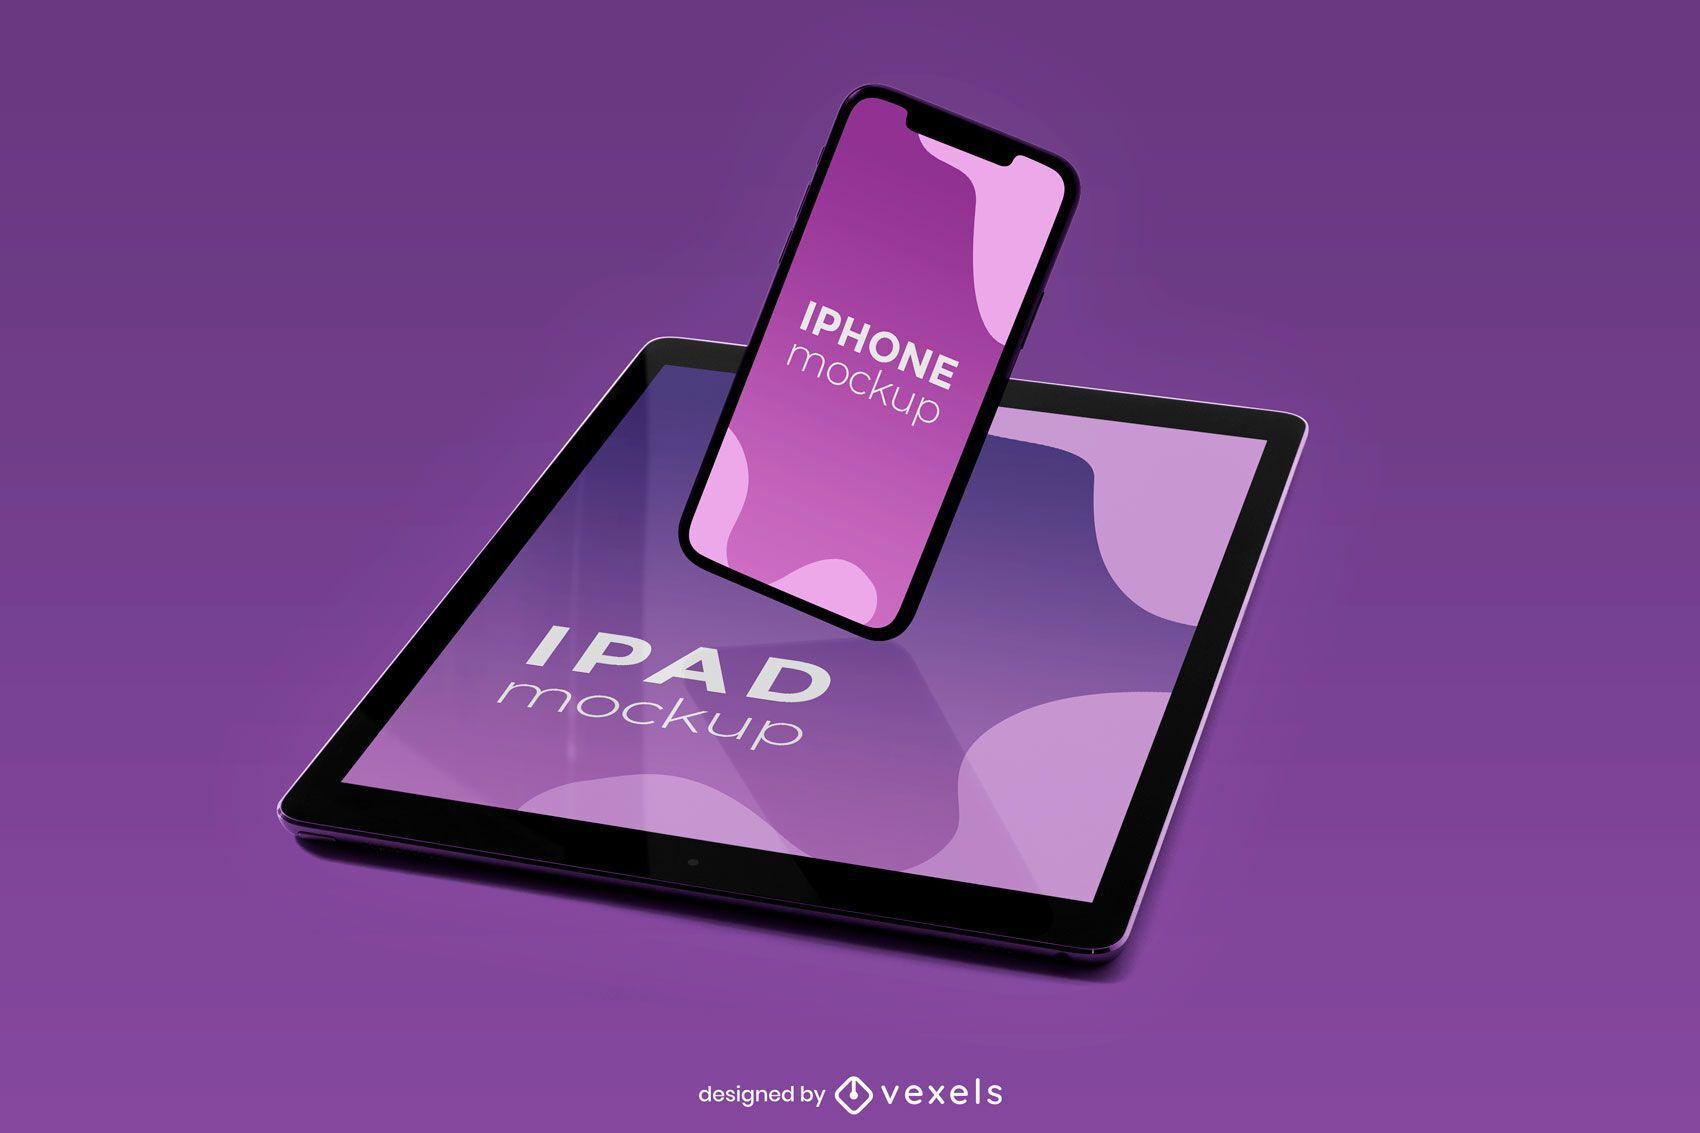 iphone ipad mockup design